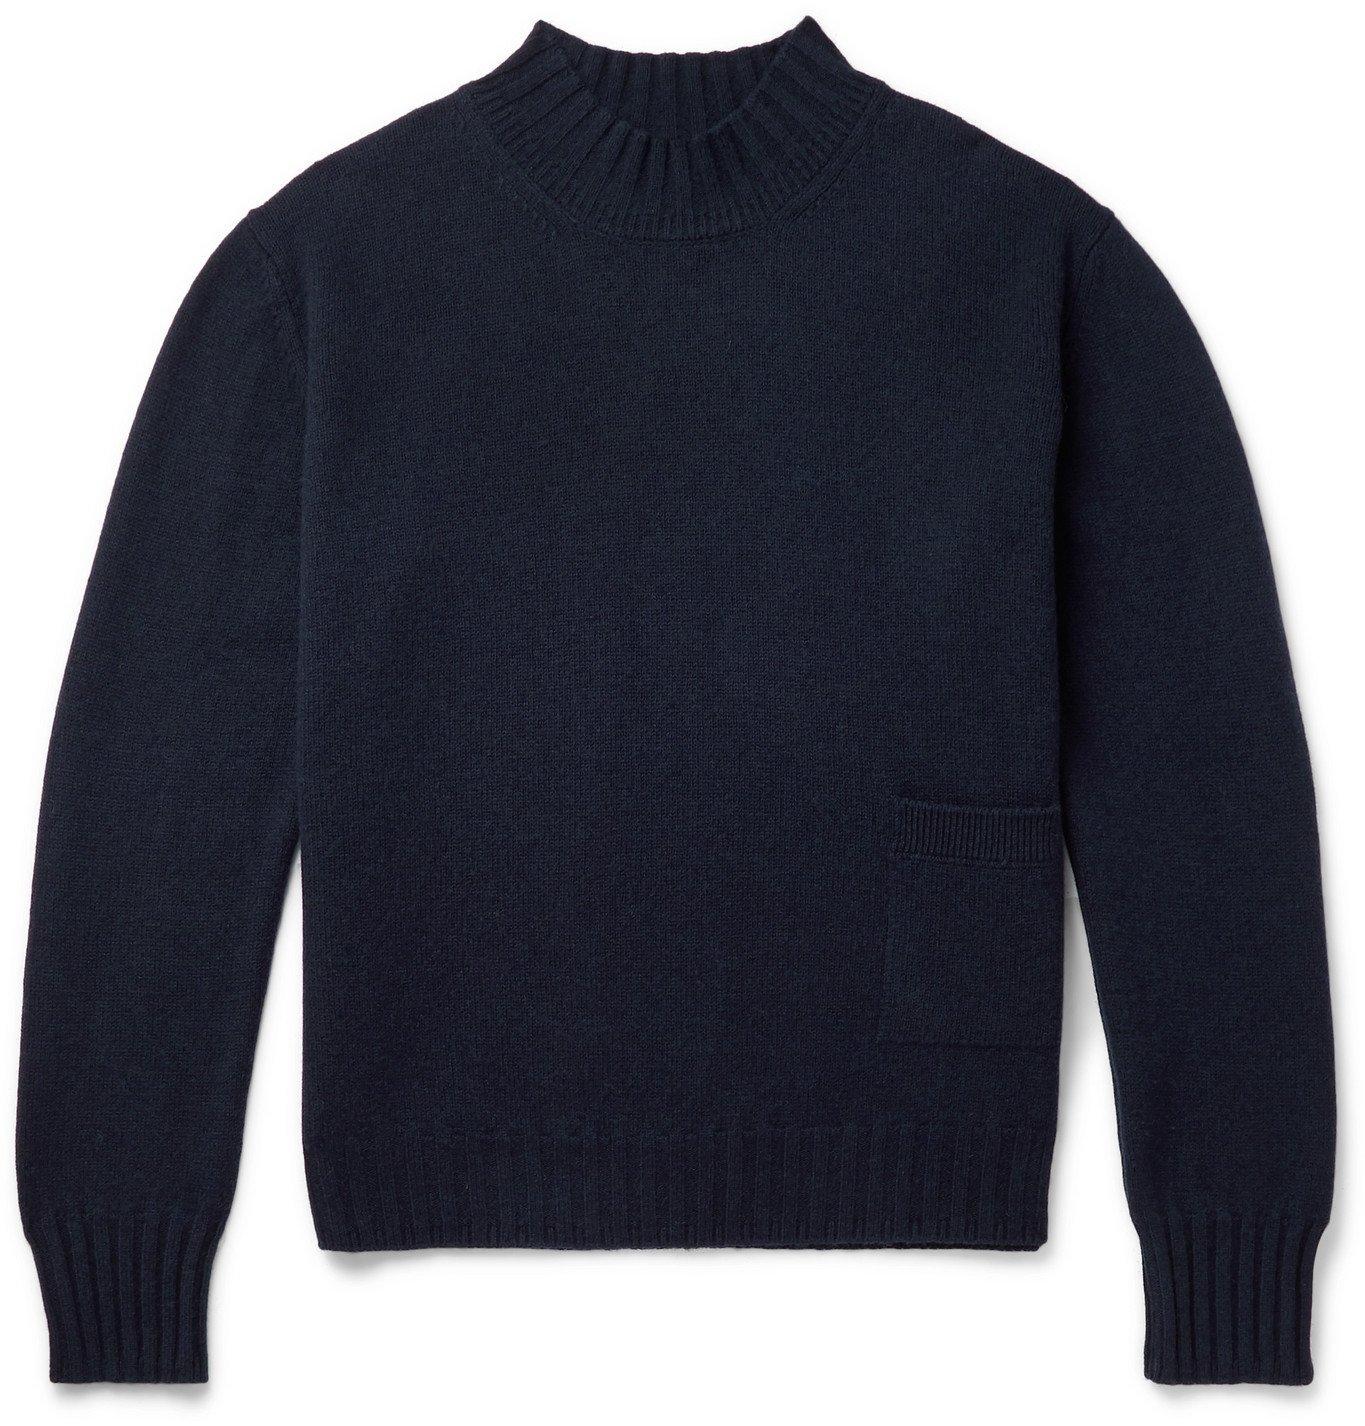 Margaret Howell - Merino Wool Mock-Neck Sweater - Blue